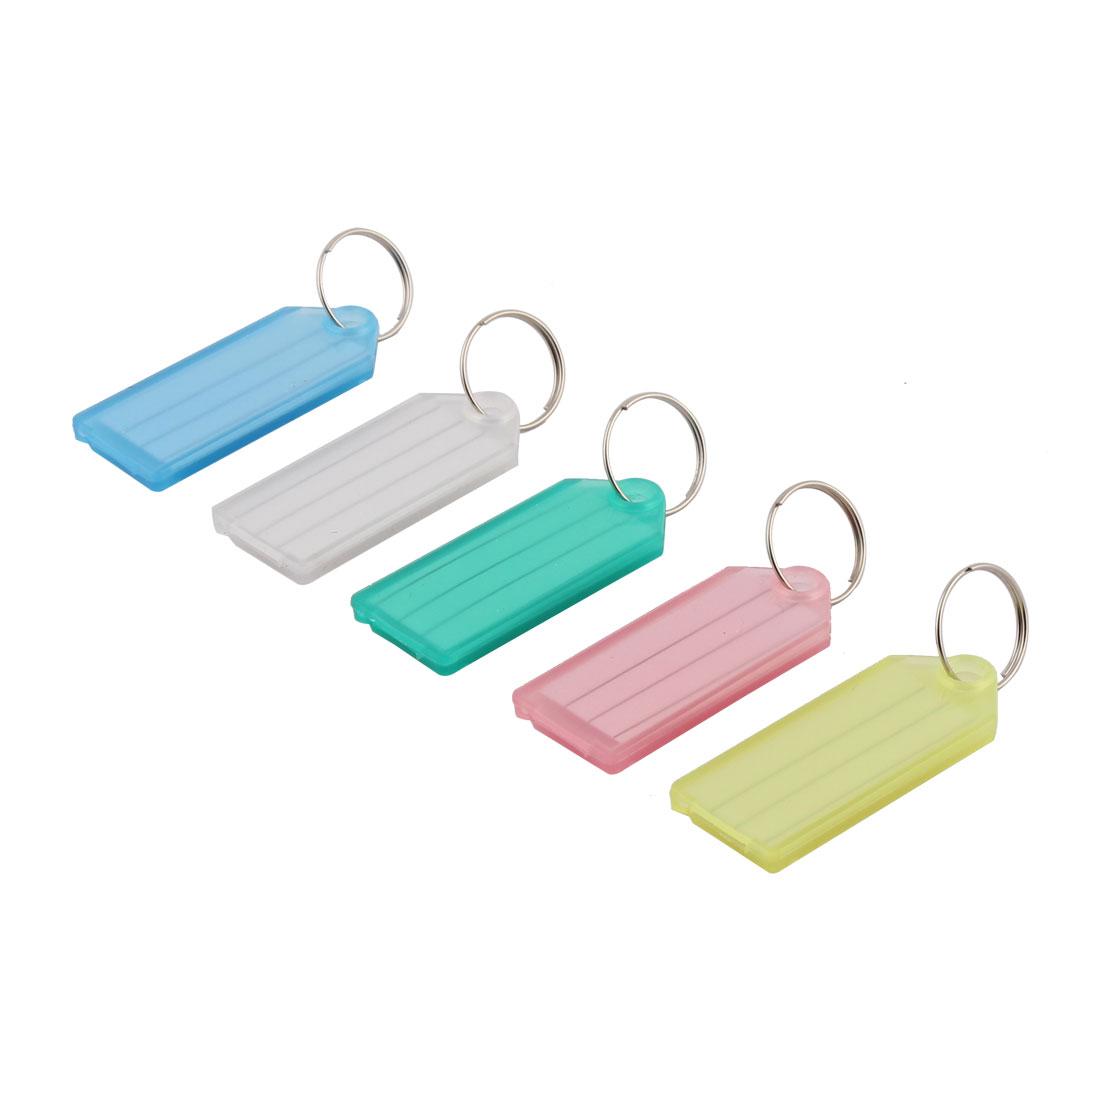 Travel Outdoor Plastic Rectangle Shaped Suitcase Luggage Tag Label Keyring 5pcs